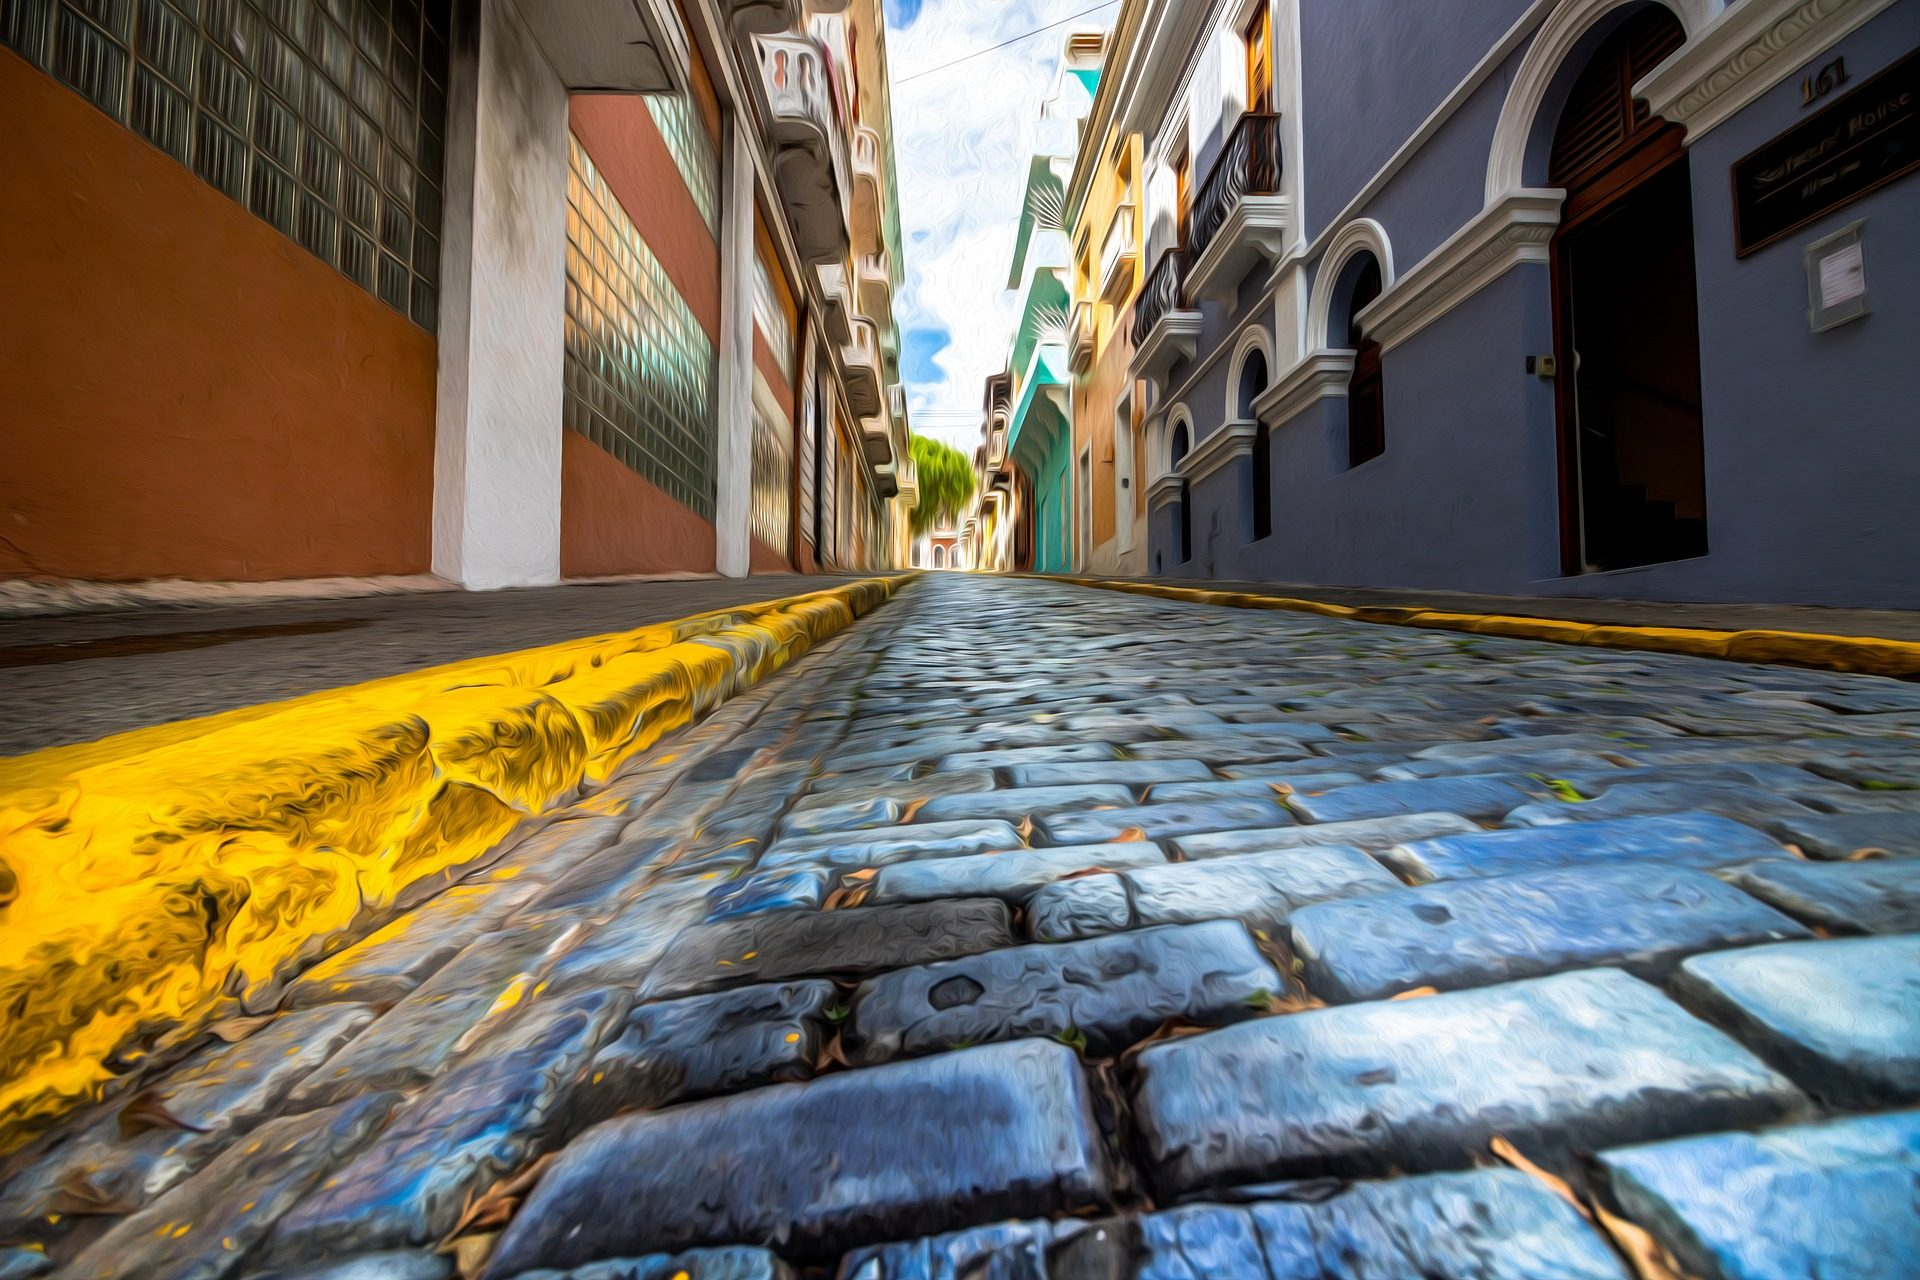 calle, acera, empedrado, casas, colorido - Fondos de Pantalla HD - professor-falken.com